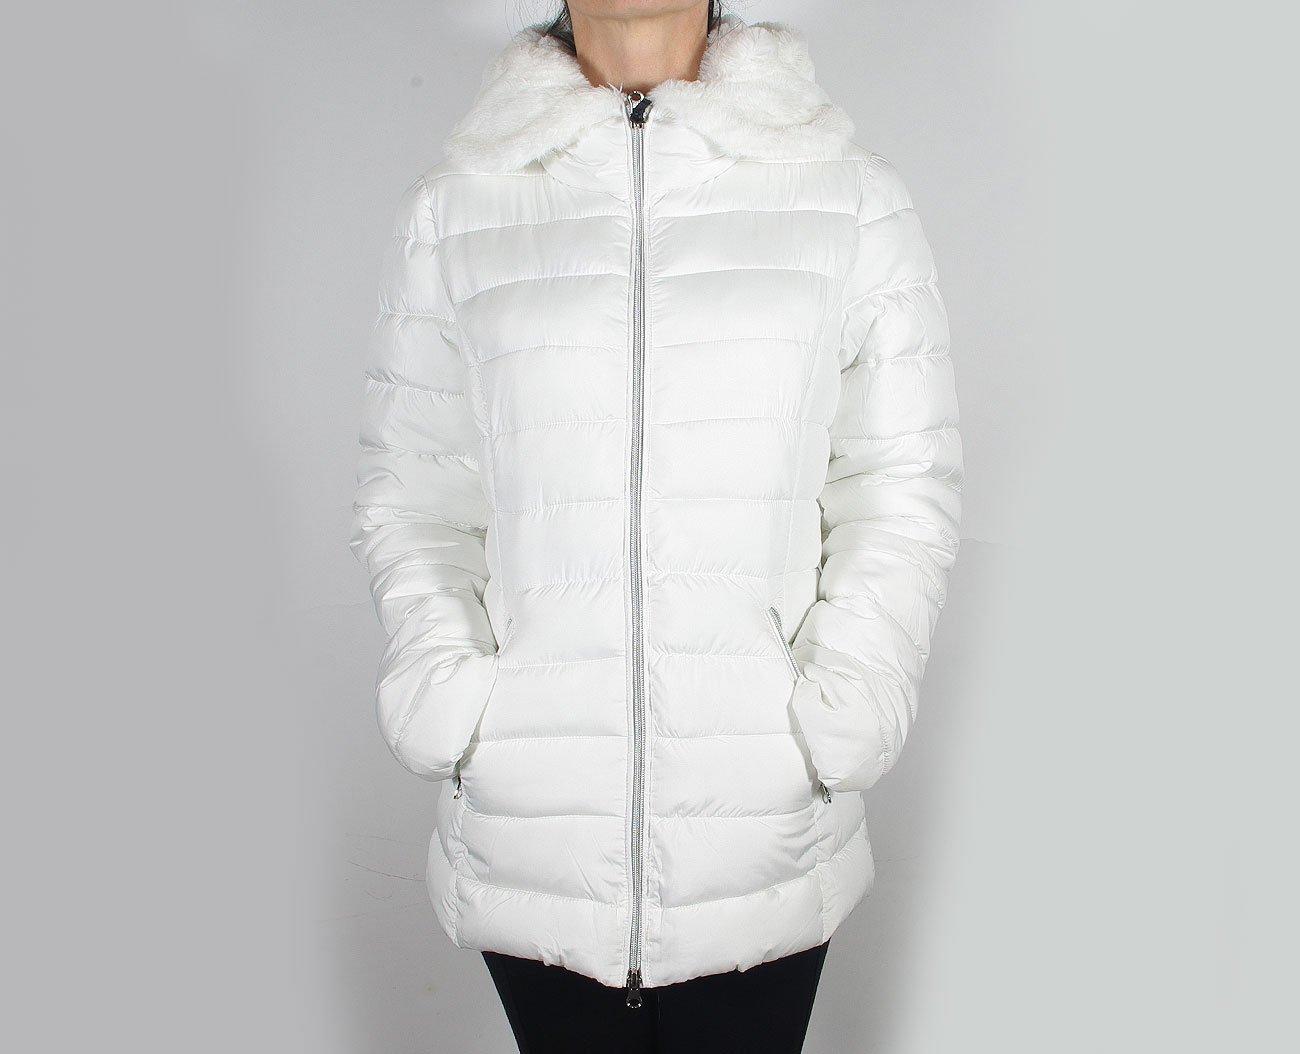 Evita Cloe kurtka microfibra biały